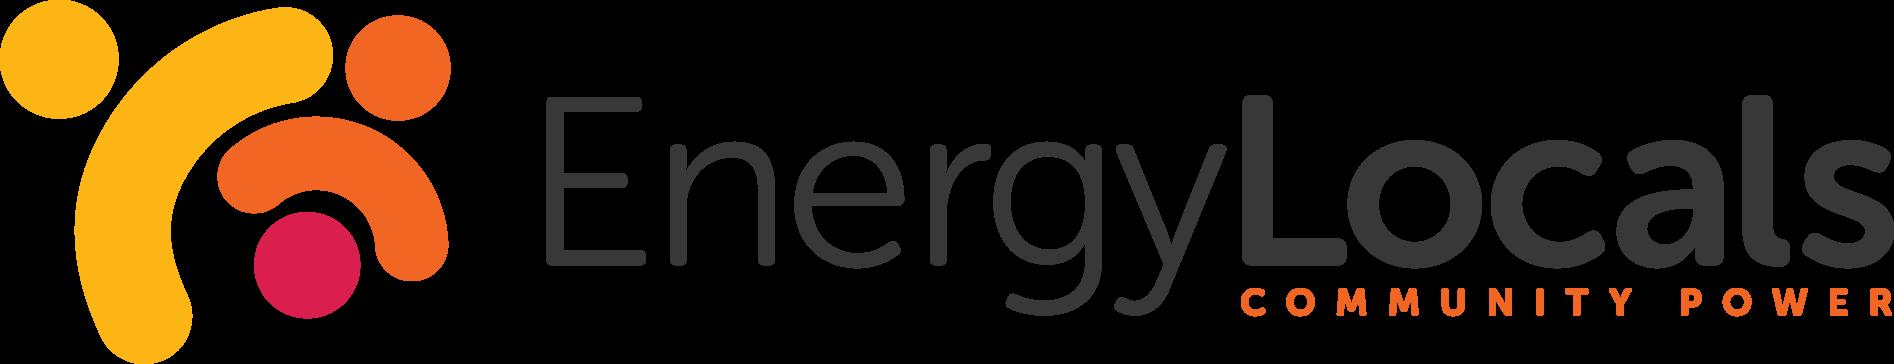 EnergyLocals_HorizontalLogo_Colour.png